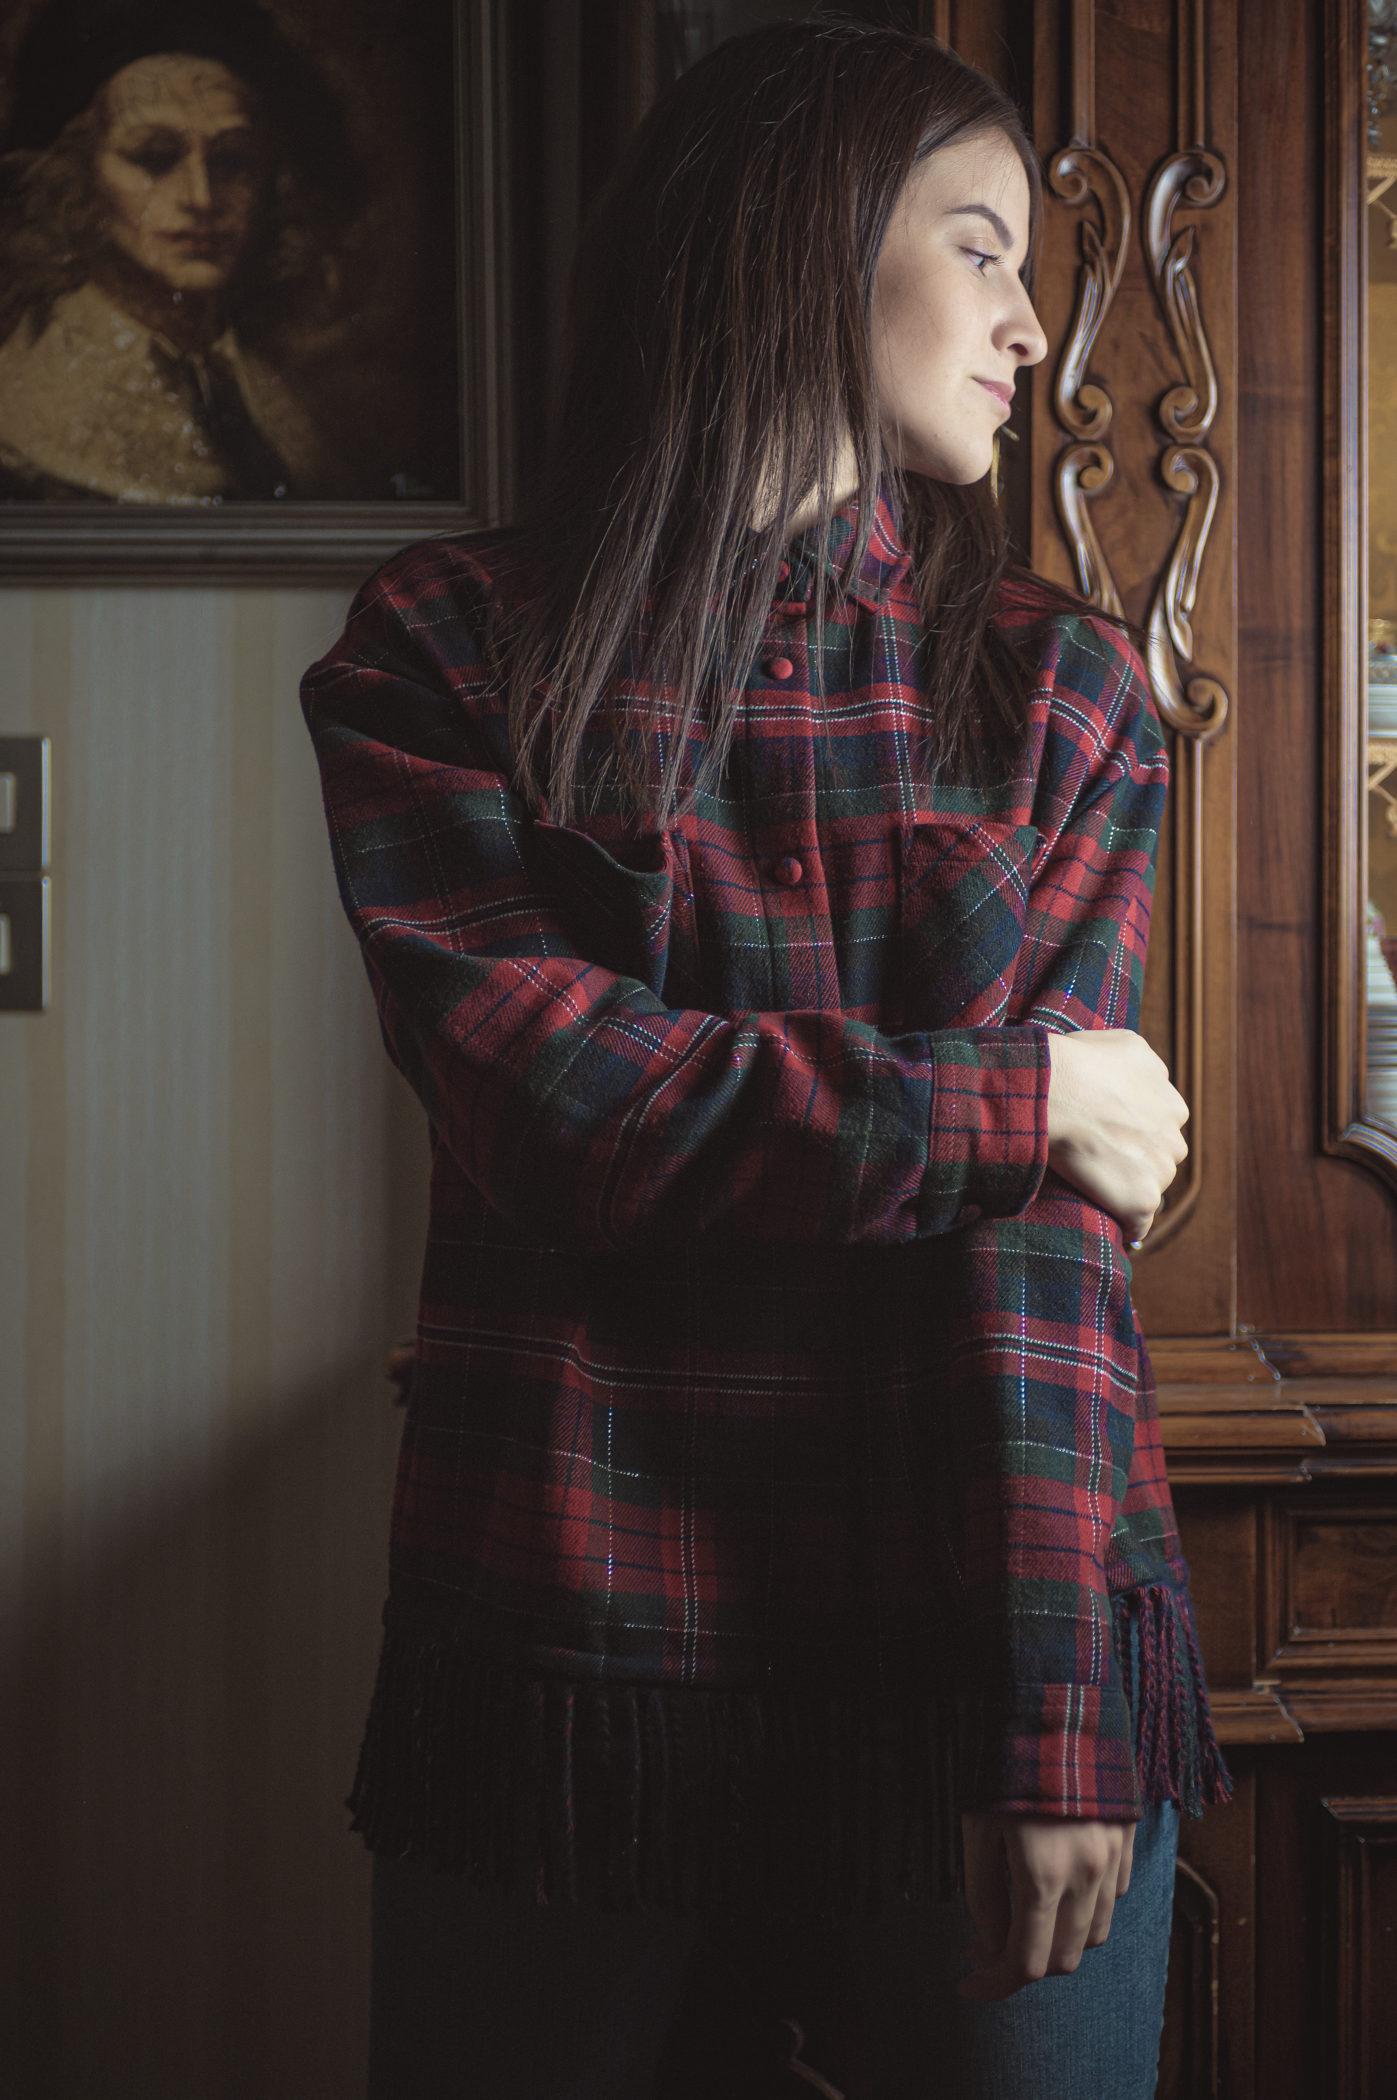 DSC 2087 scaled - Alessia home Canada